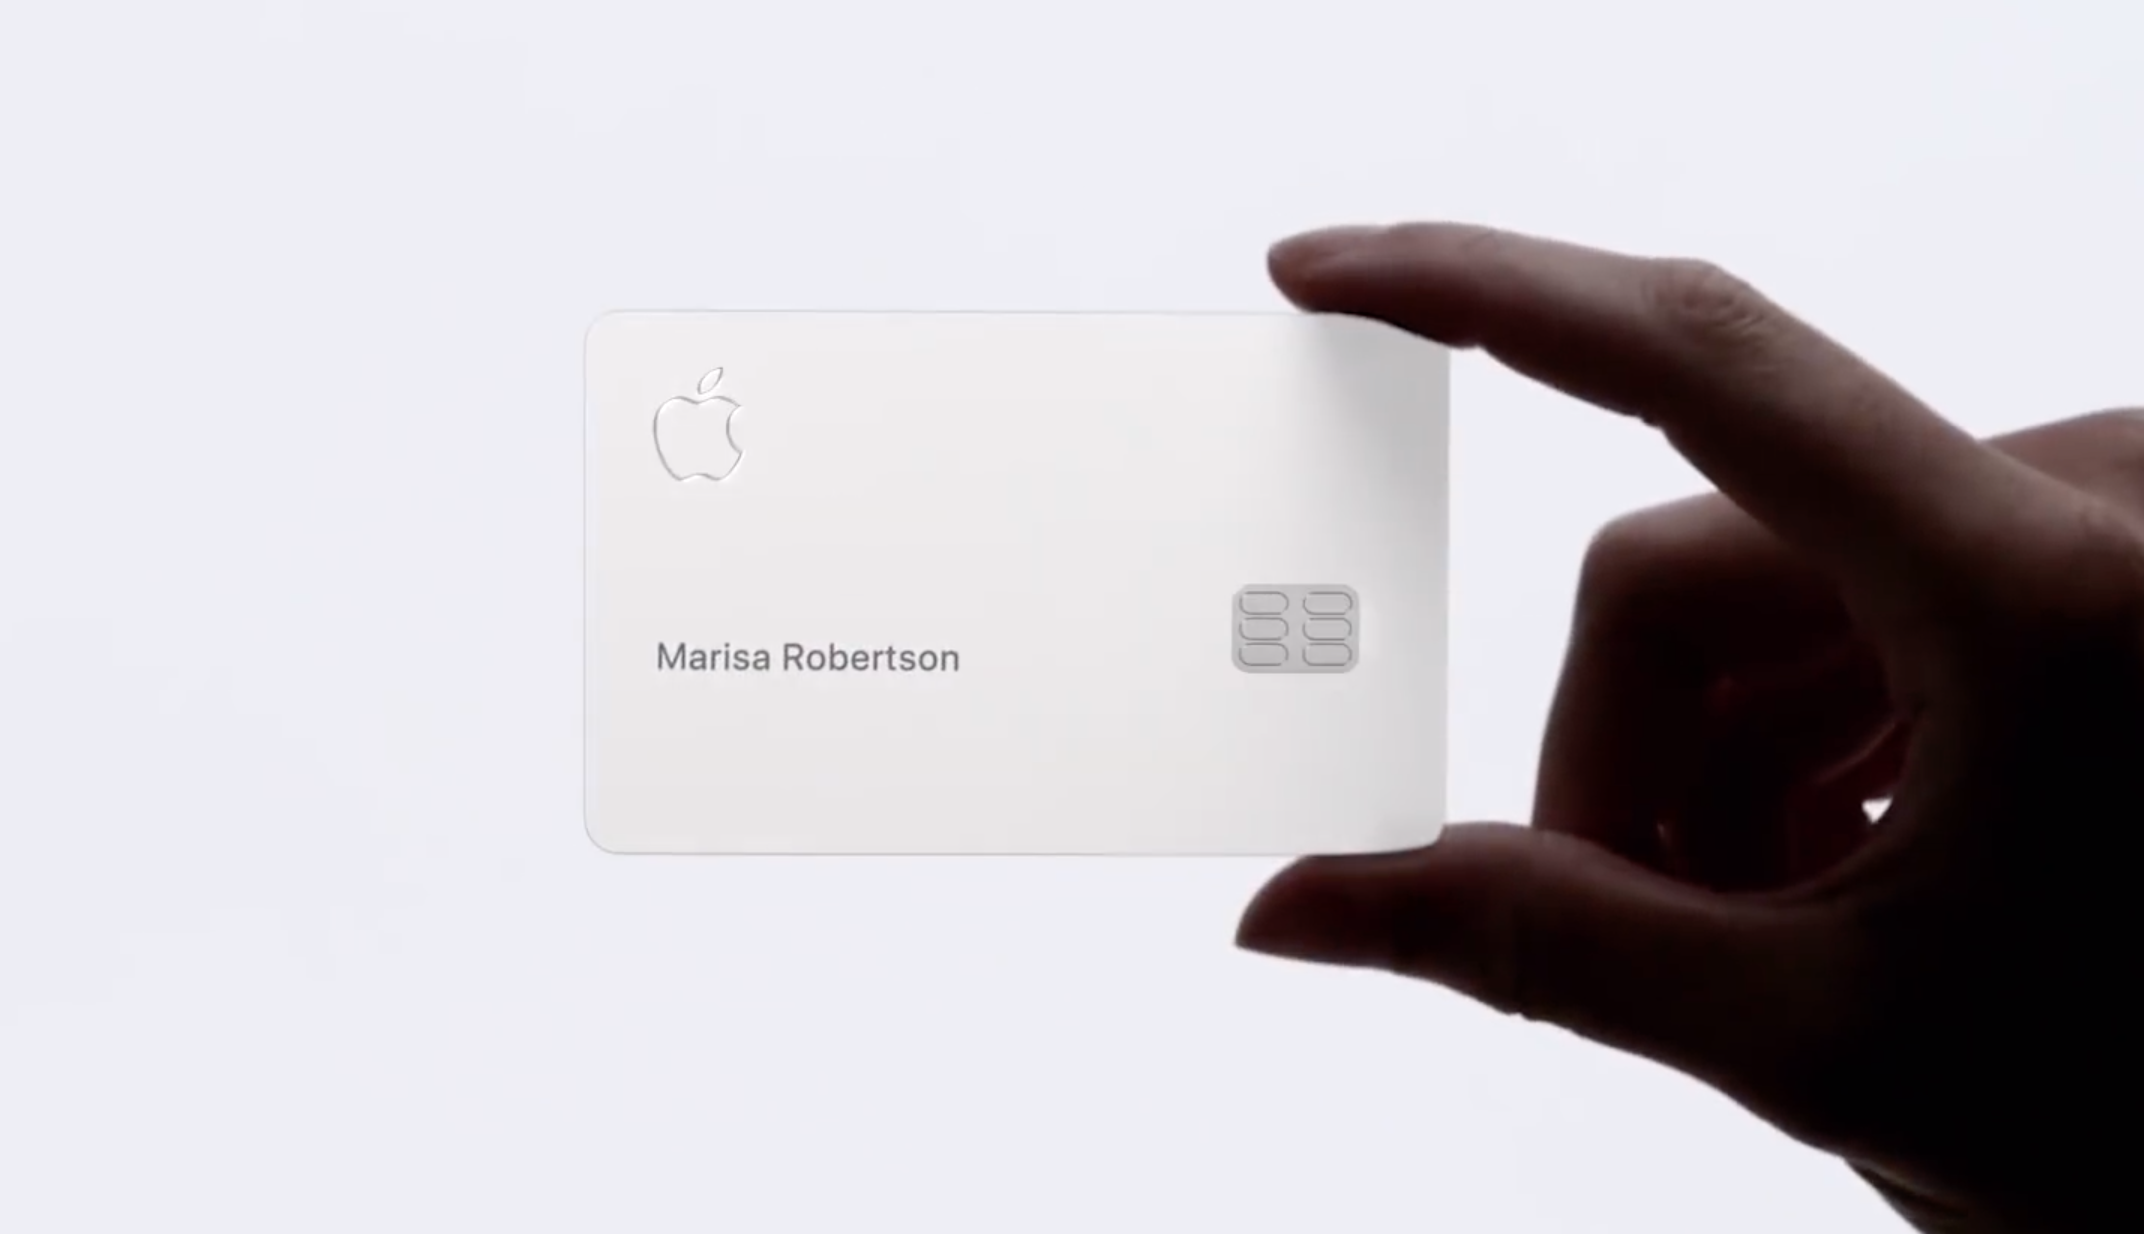 Apple Card, monedero digital de Iphone